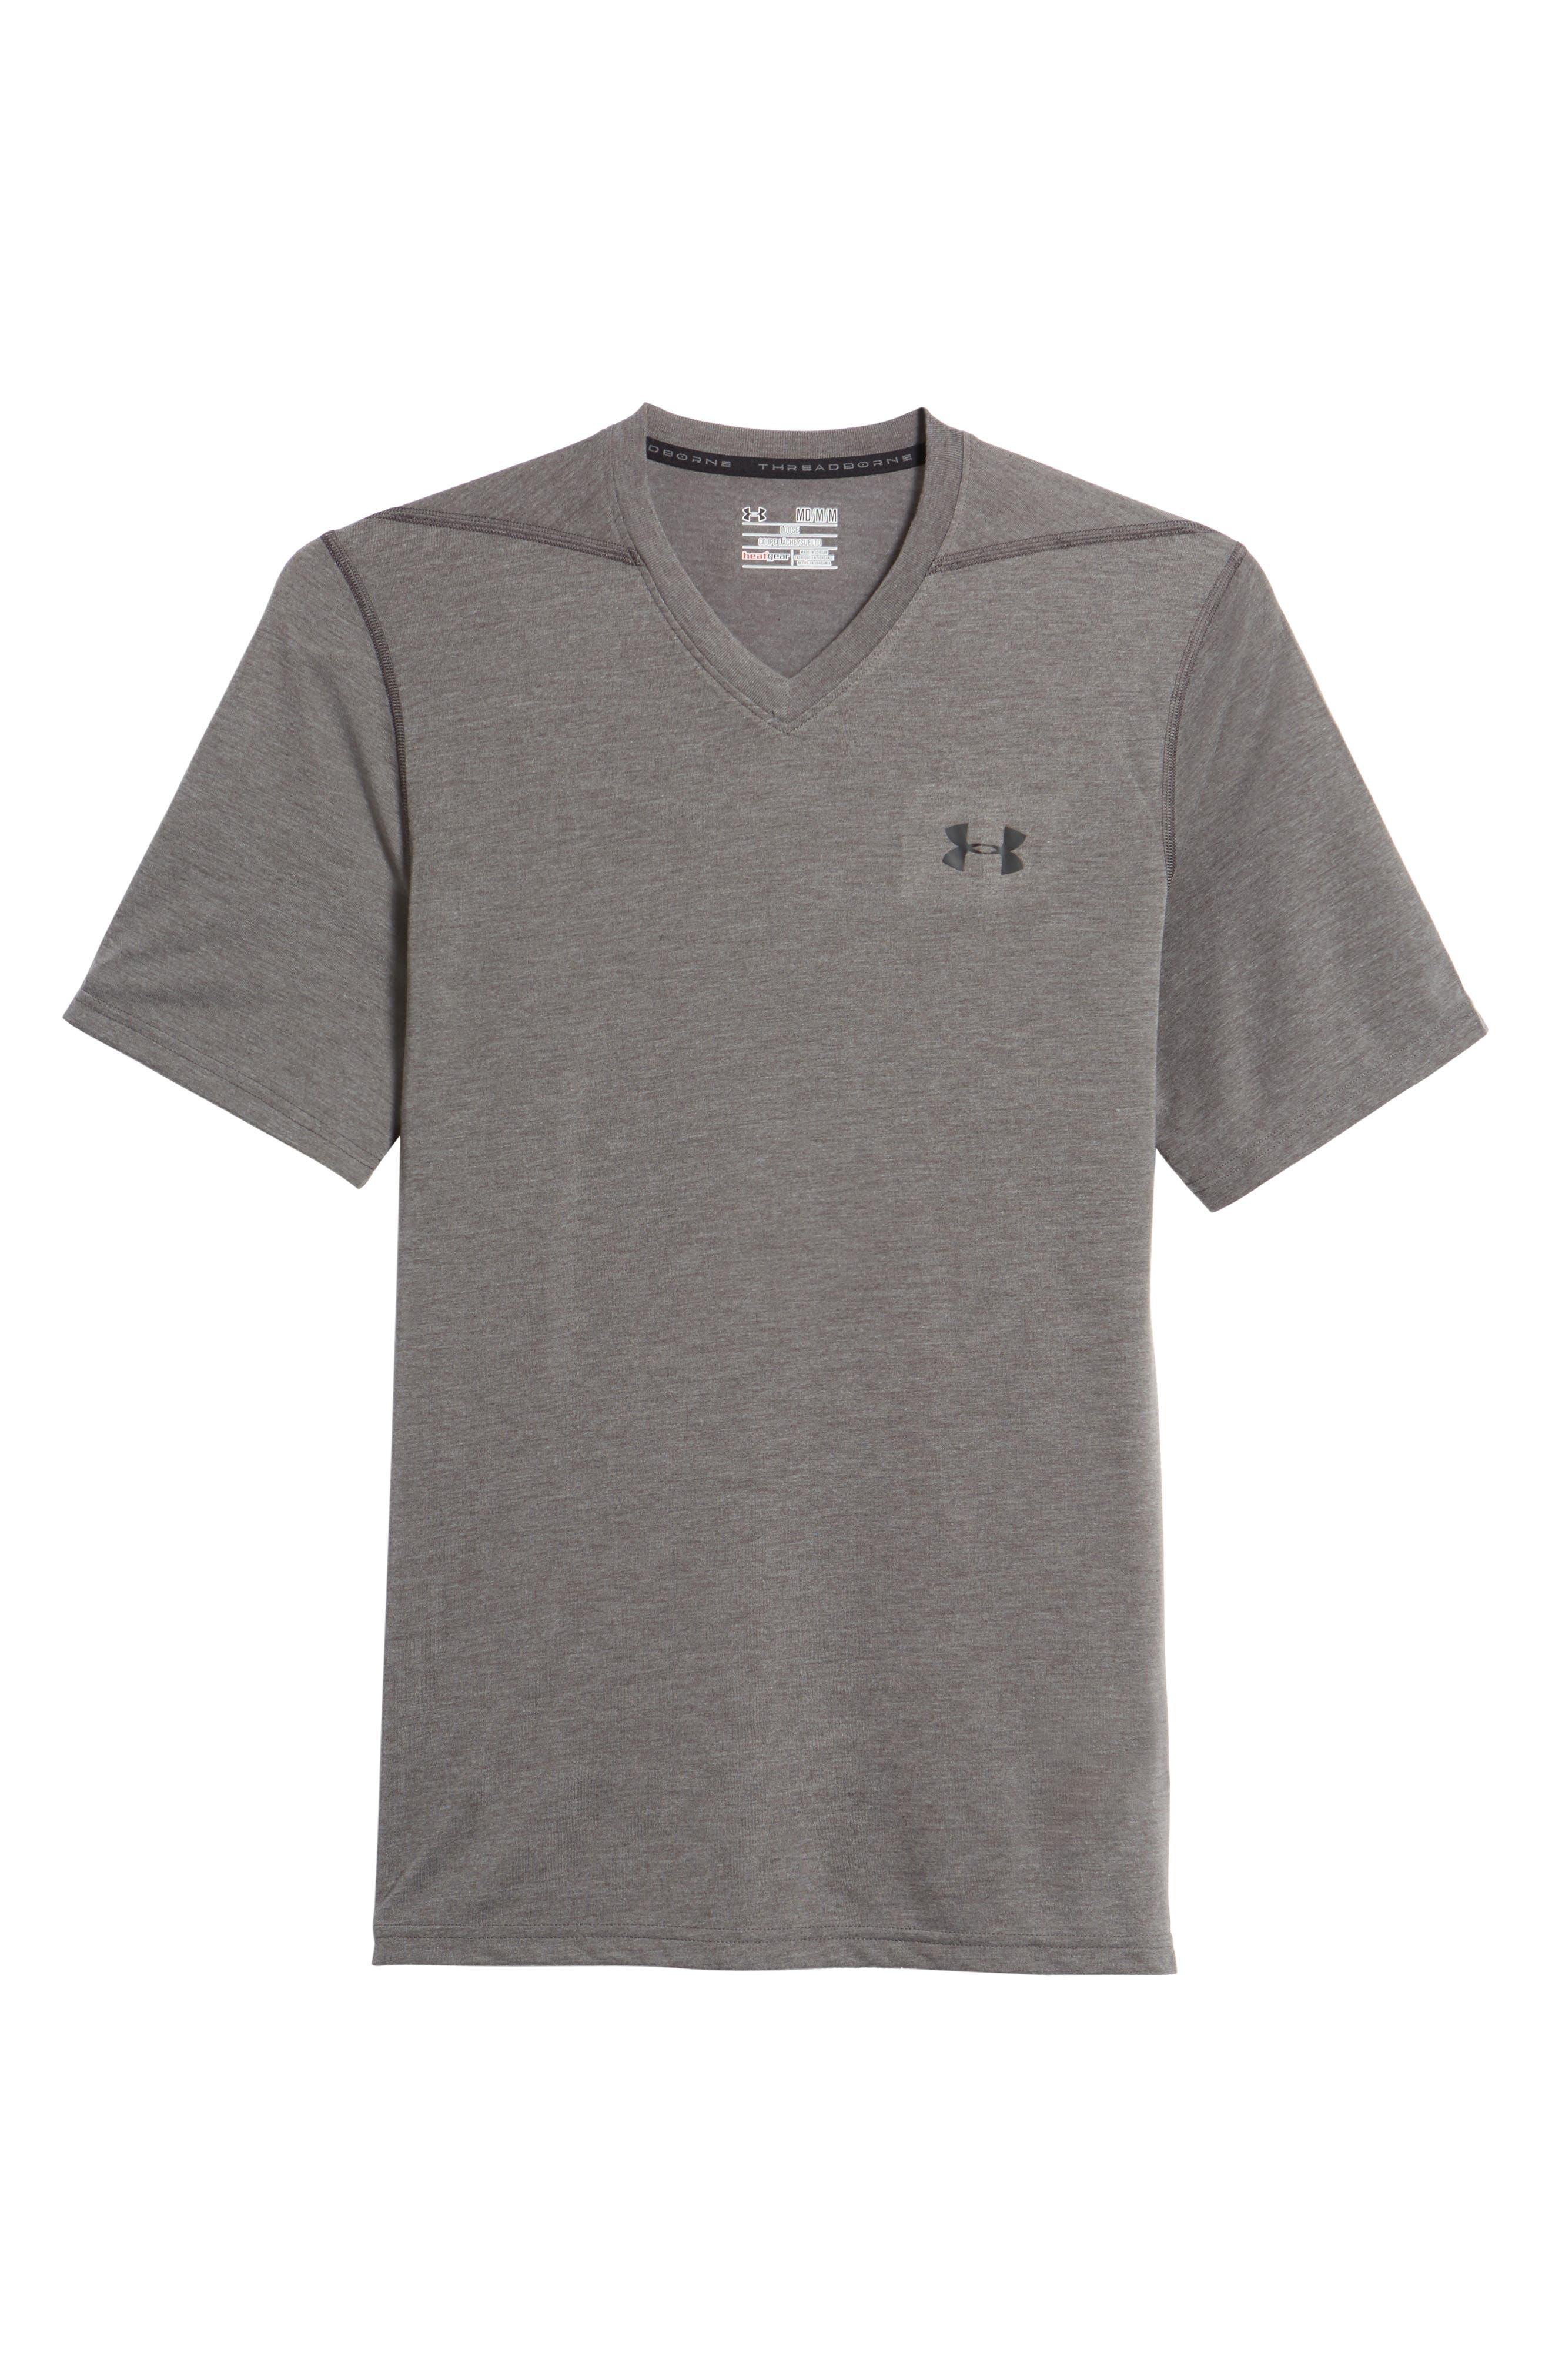 Regular Fit Threadborne T-Shirt,                         Main,                         color, Carbon Heather